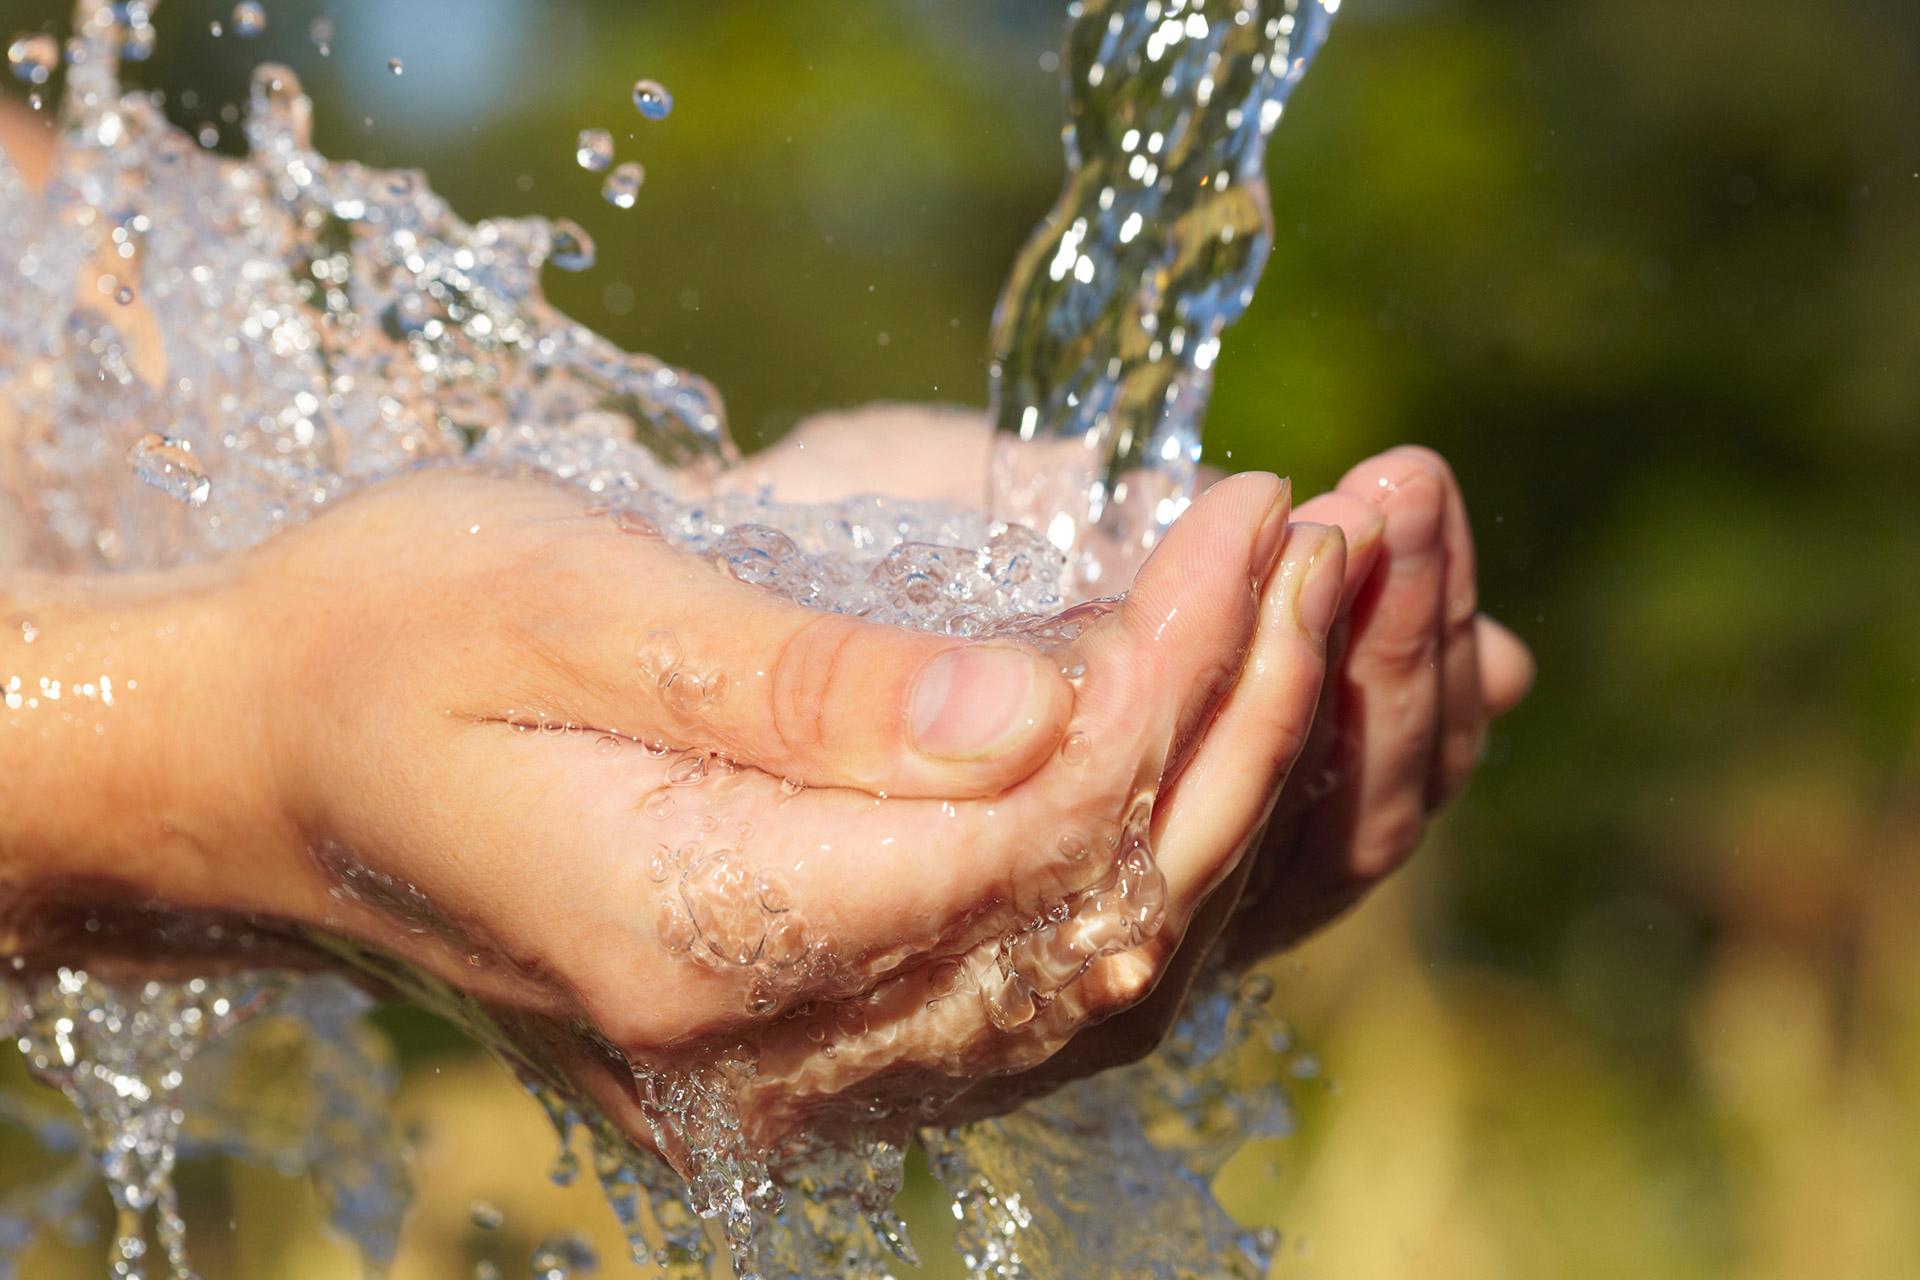 Seattle-area clean water tech startup HaloSource raises $2.2M